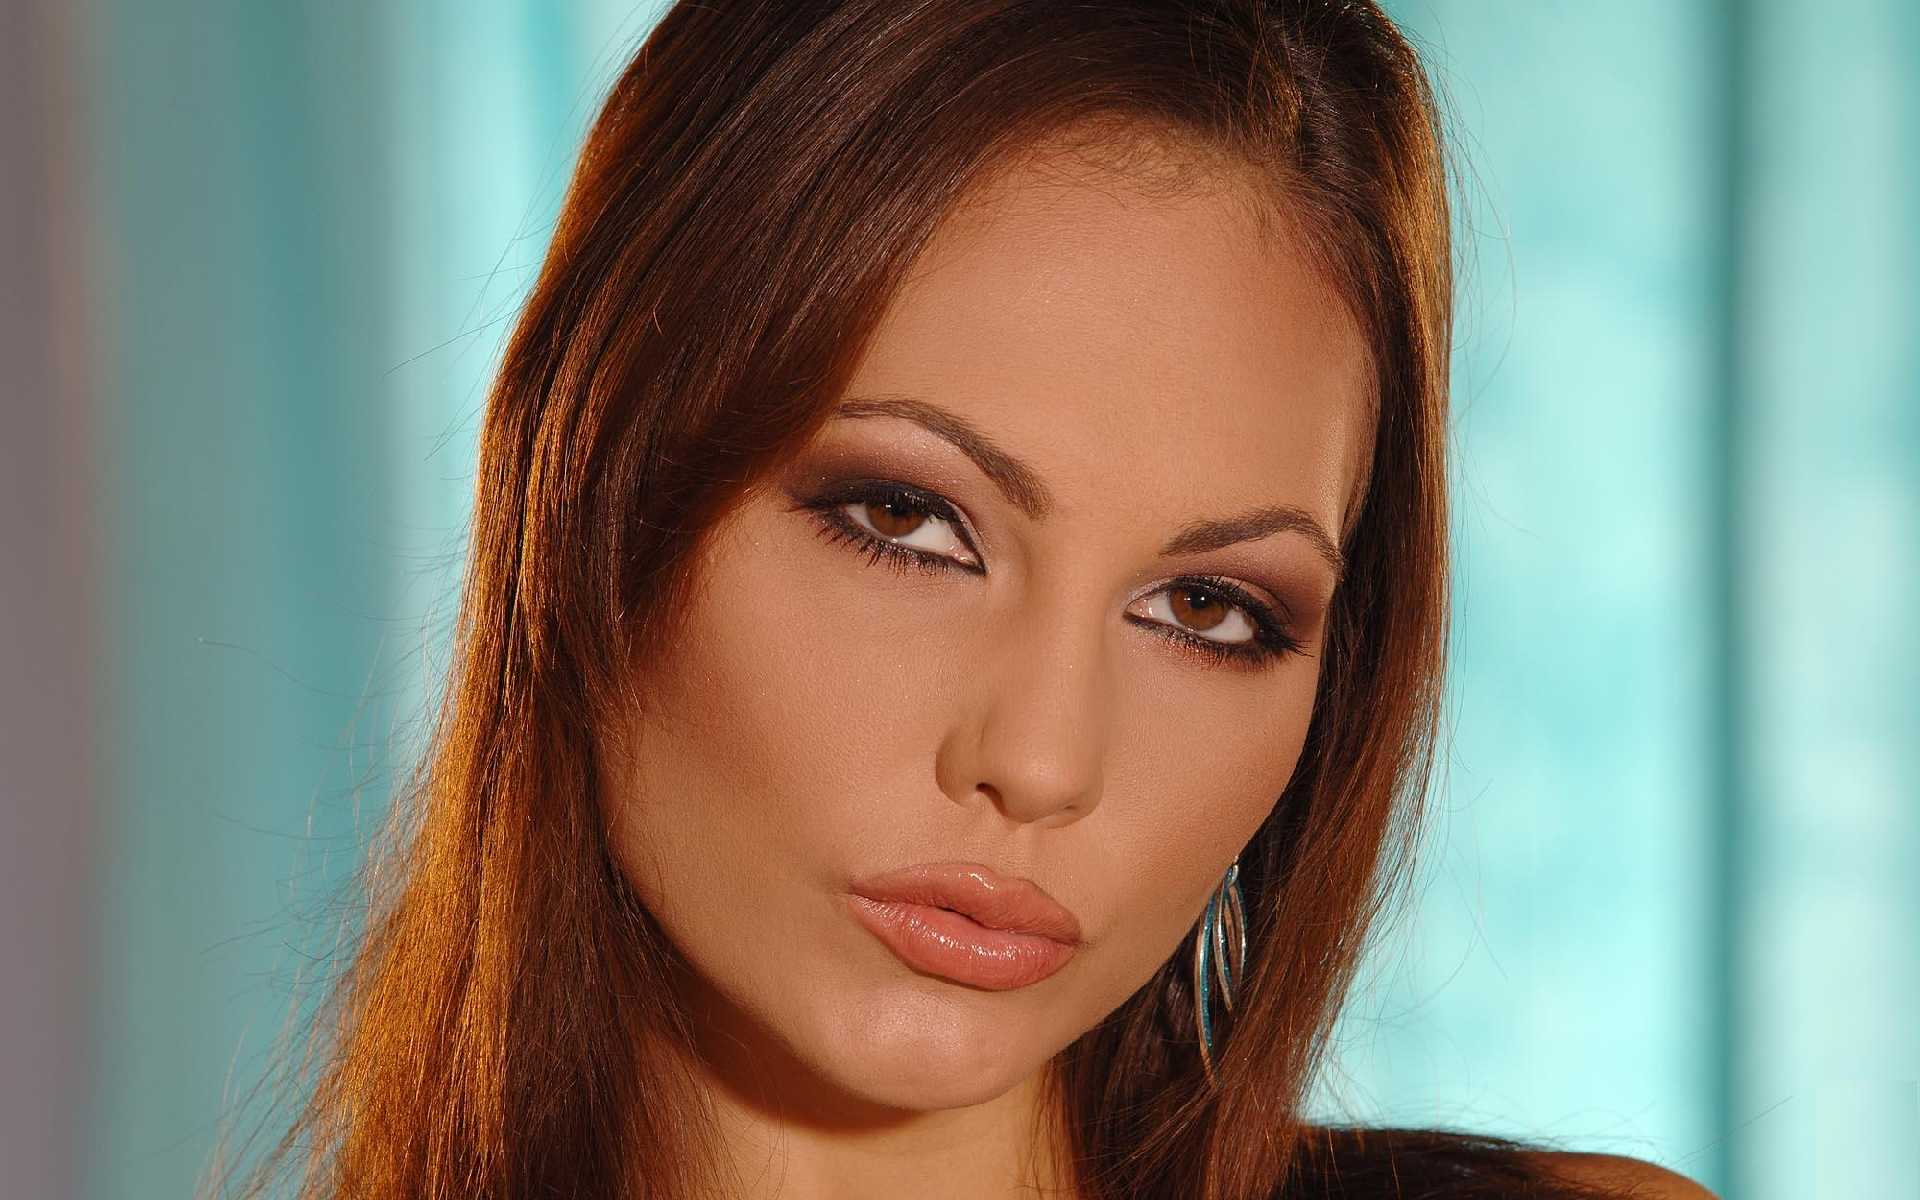 Gabriela Munzarová